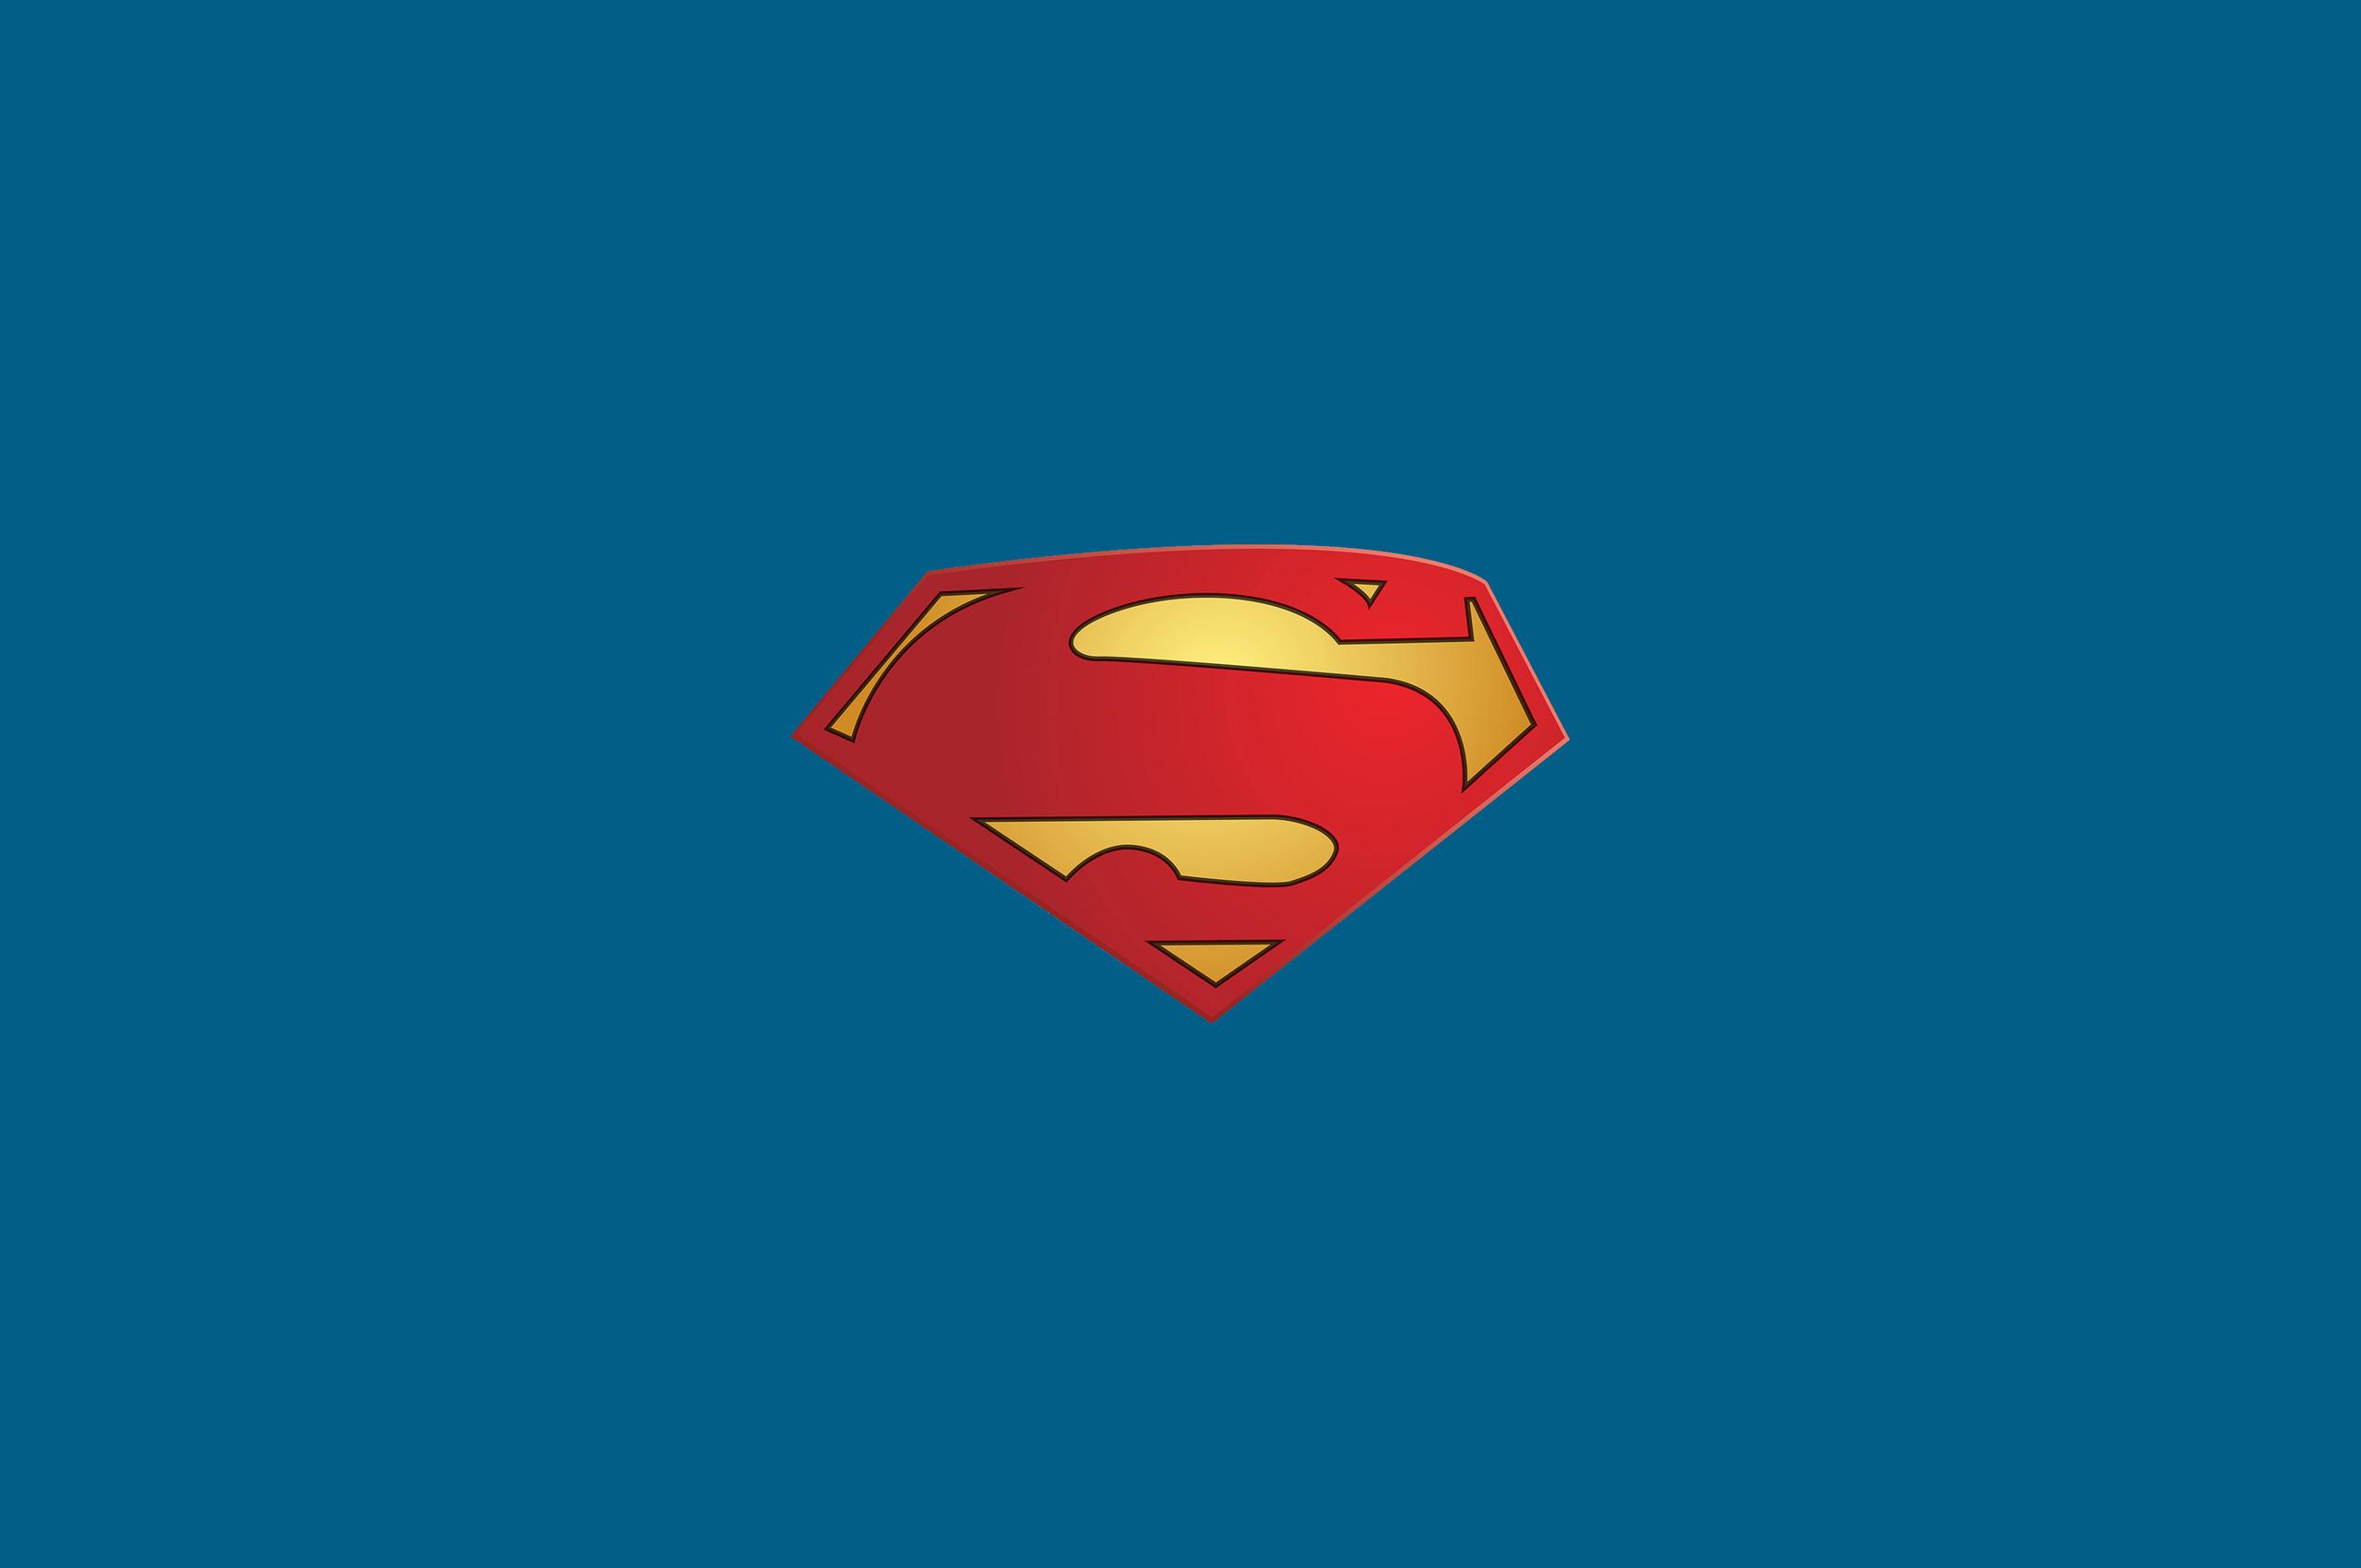 2560x1700 Superman Logo Minimal Chromebook Pixel Hd 4k